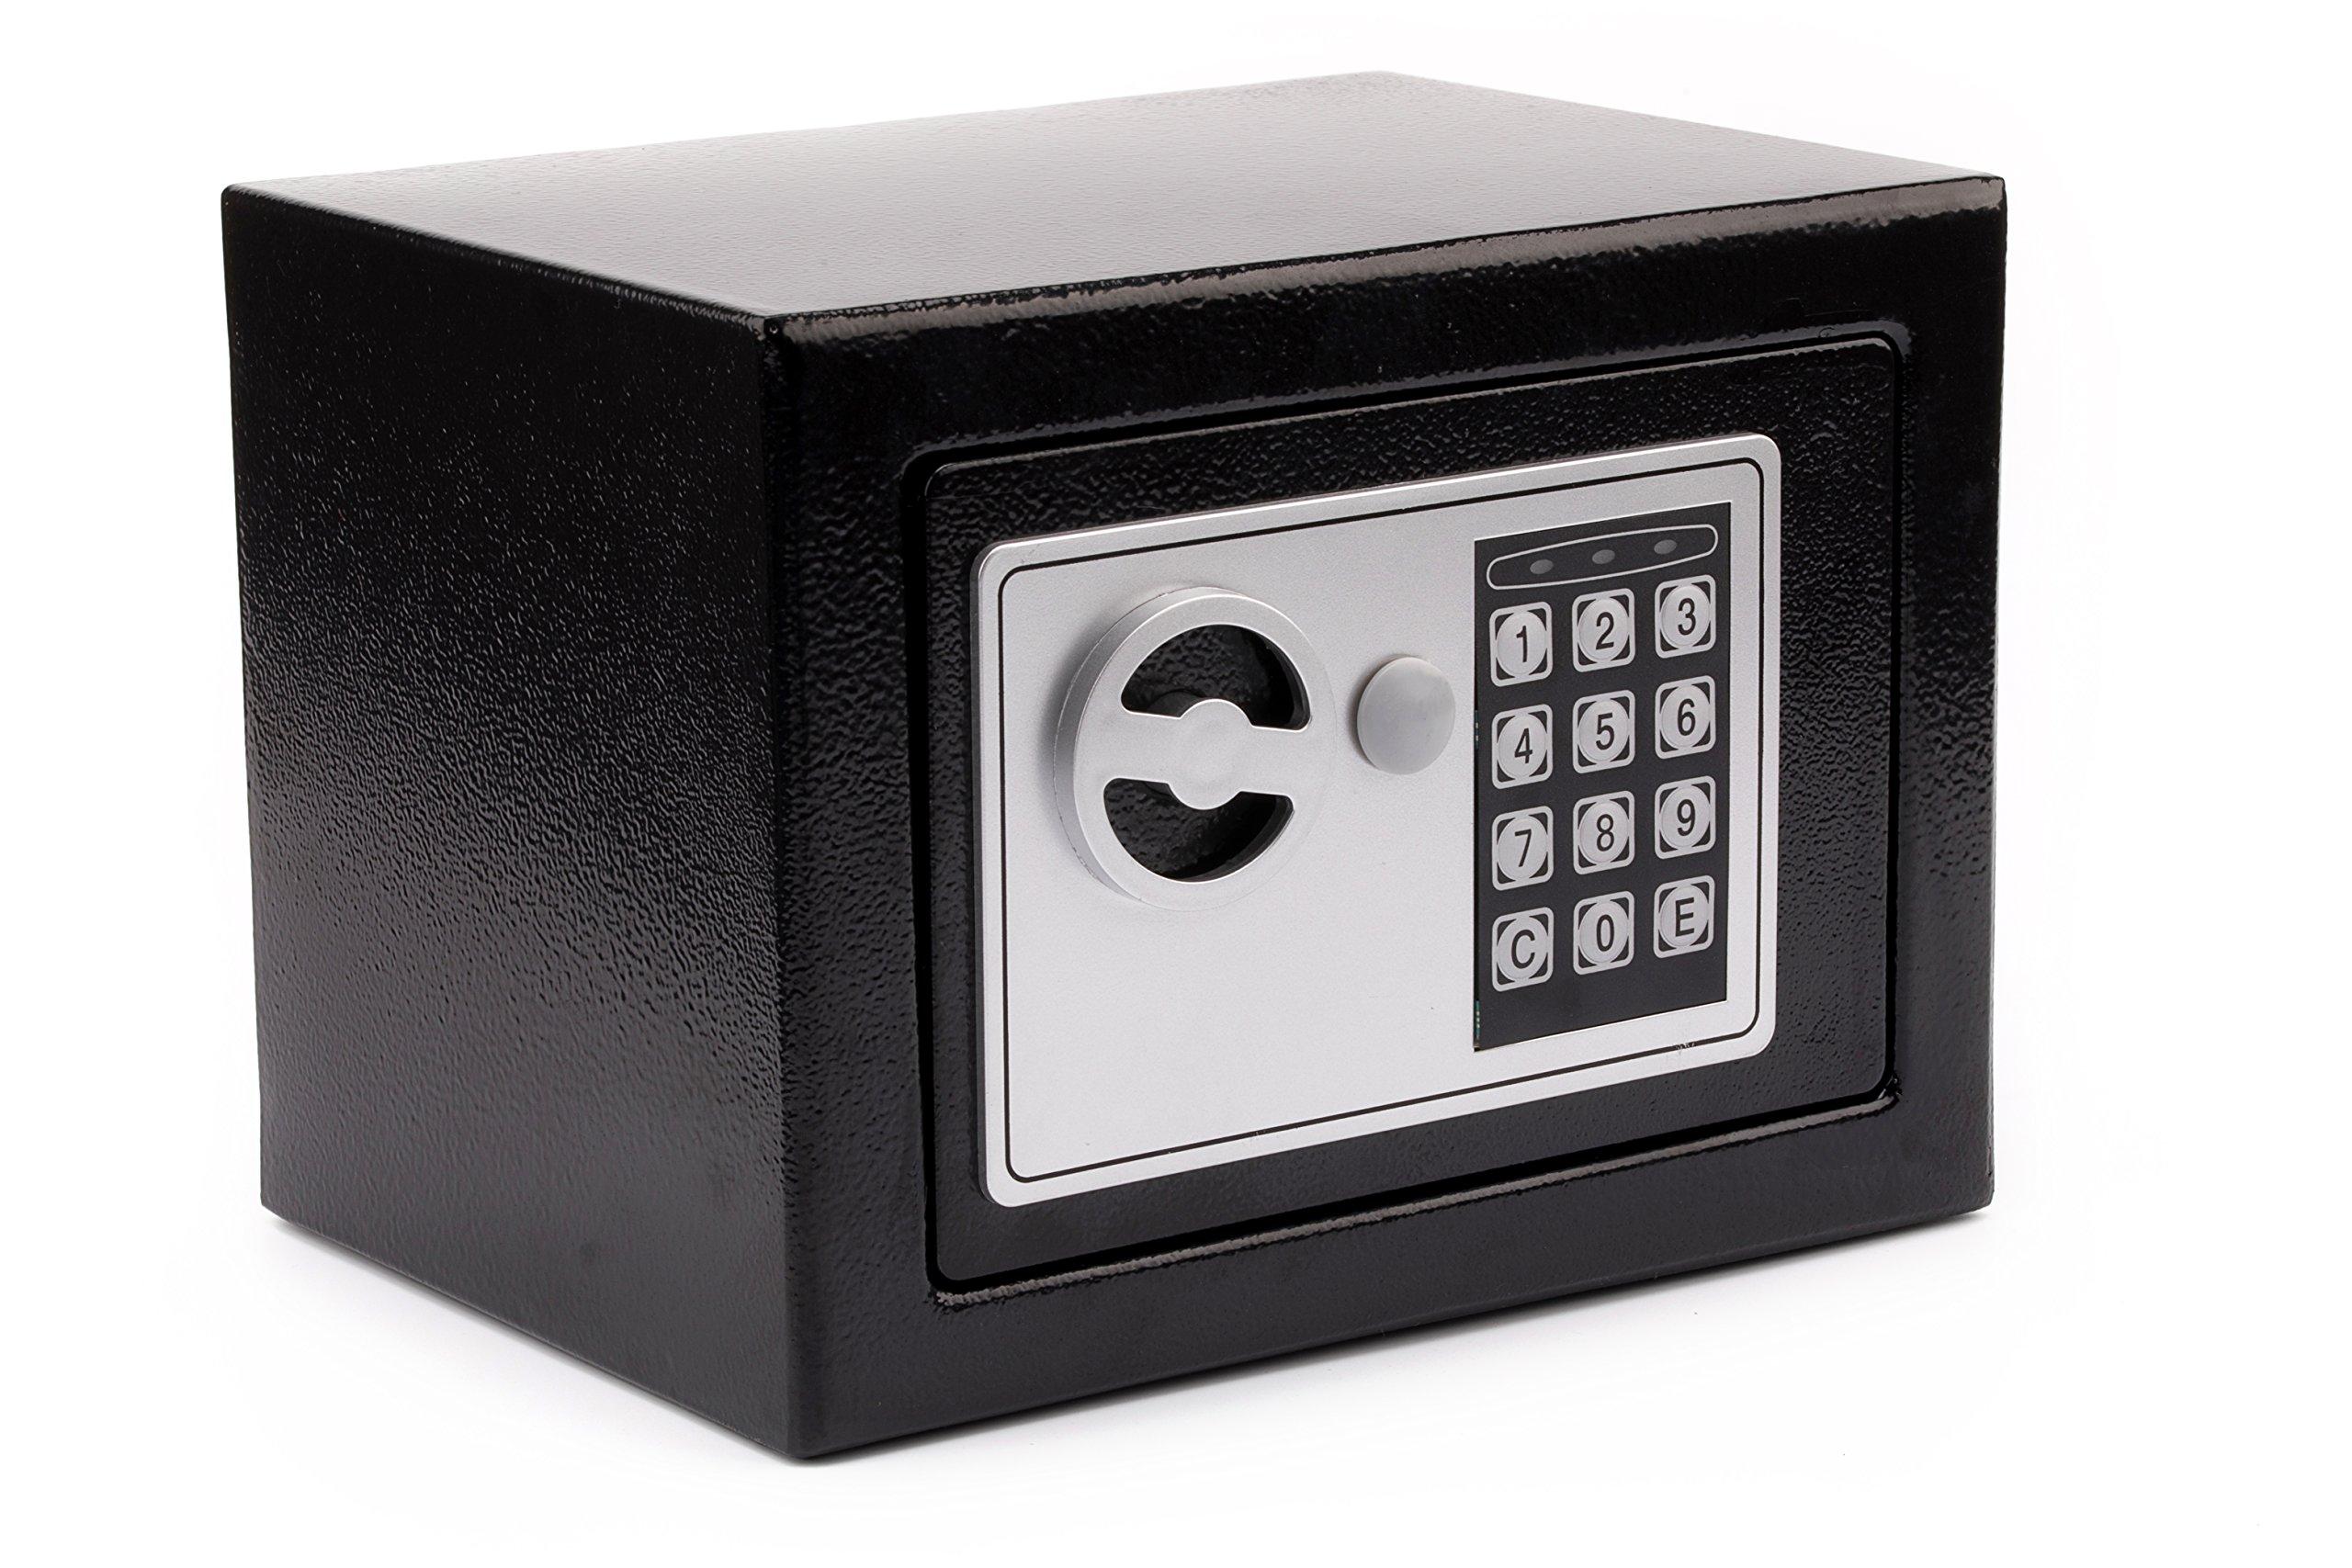 Windaze Electronic Digital Safe Box Keypad Lock for Gun Cash Jewelry Valuable Storage, 0.23 Cubic Feet